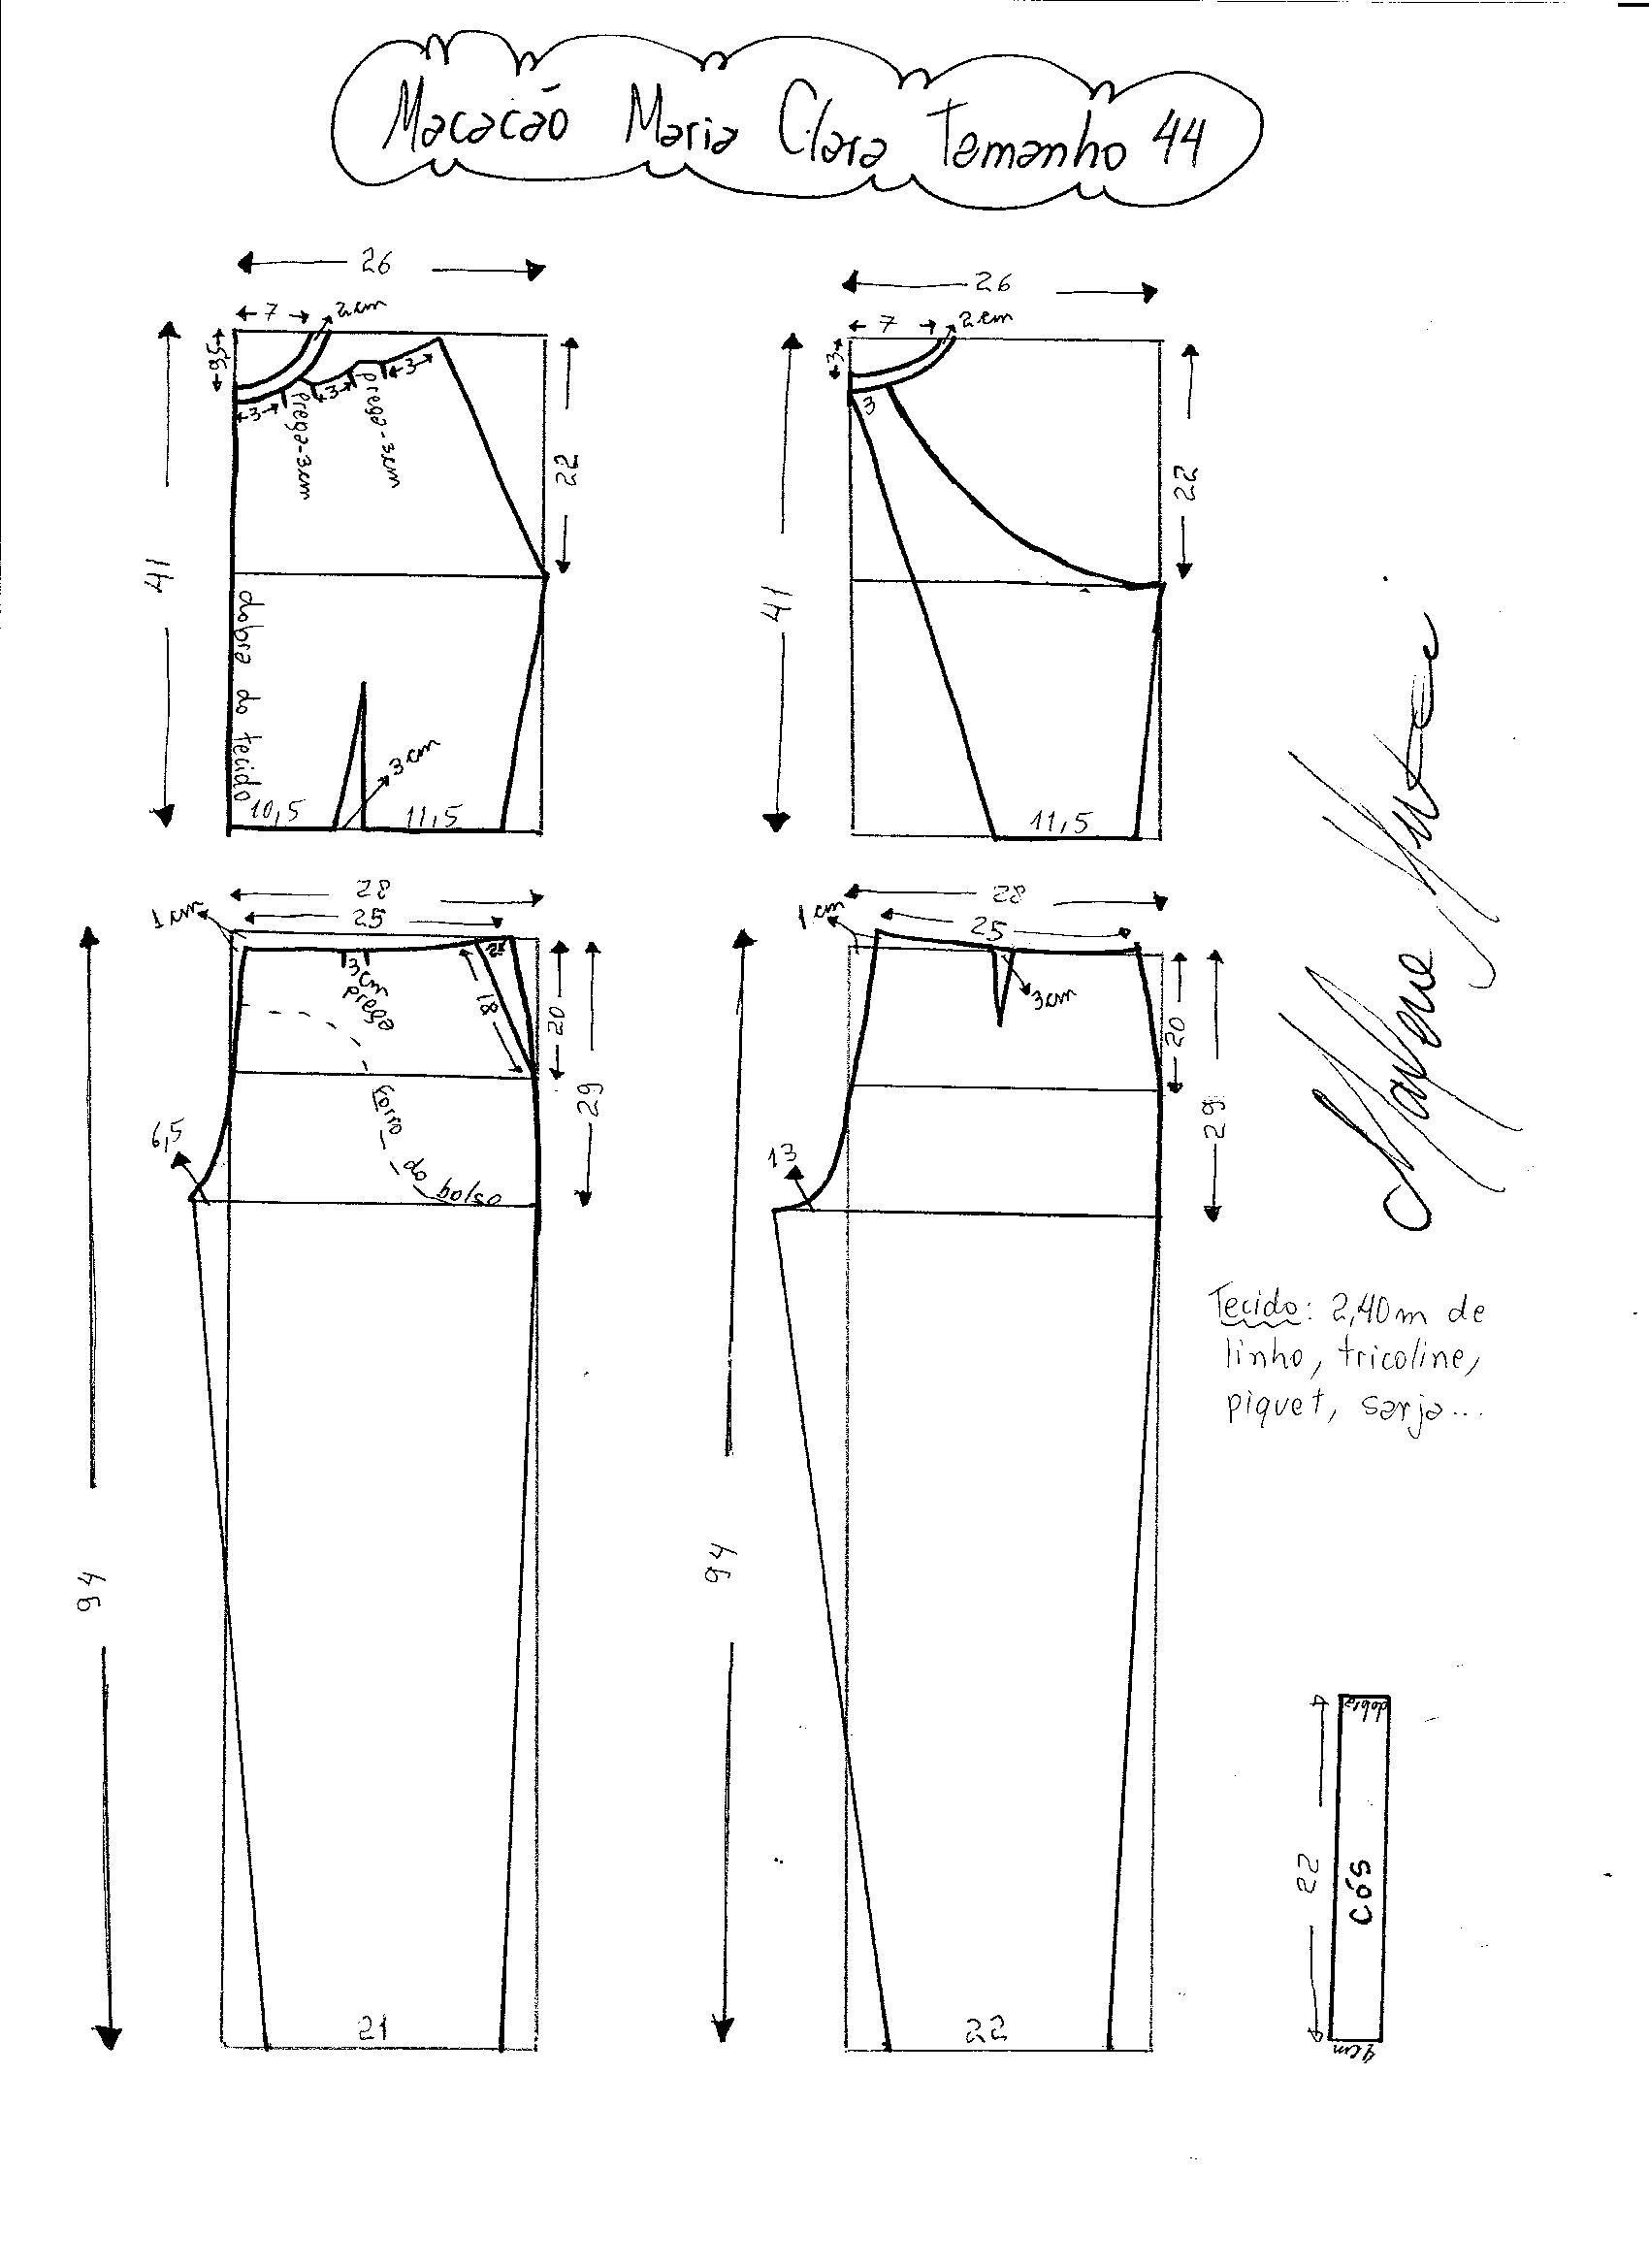 Macacão Maria Clara | Pinterest | Costura, Molde y Patrones de costura